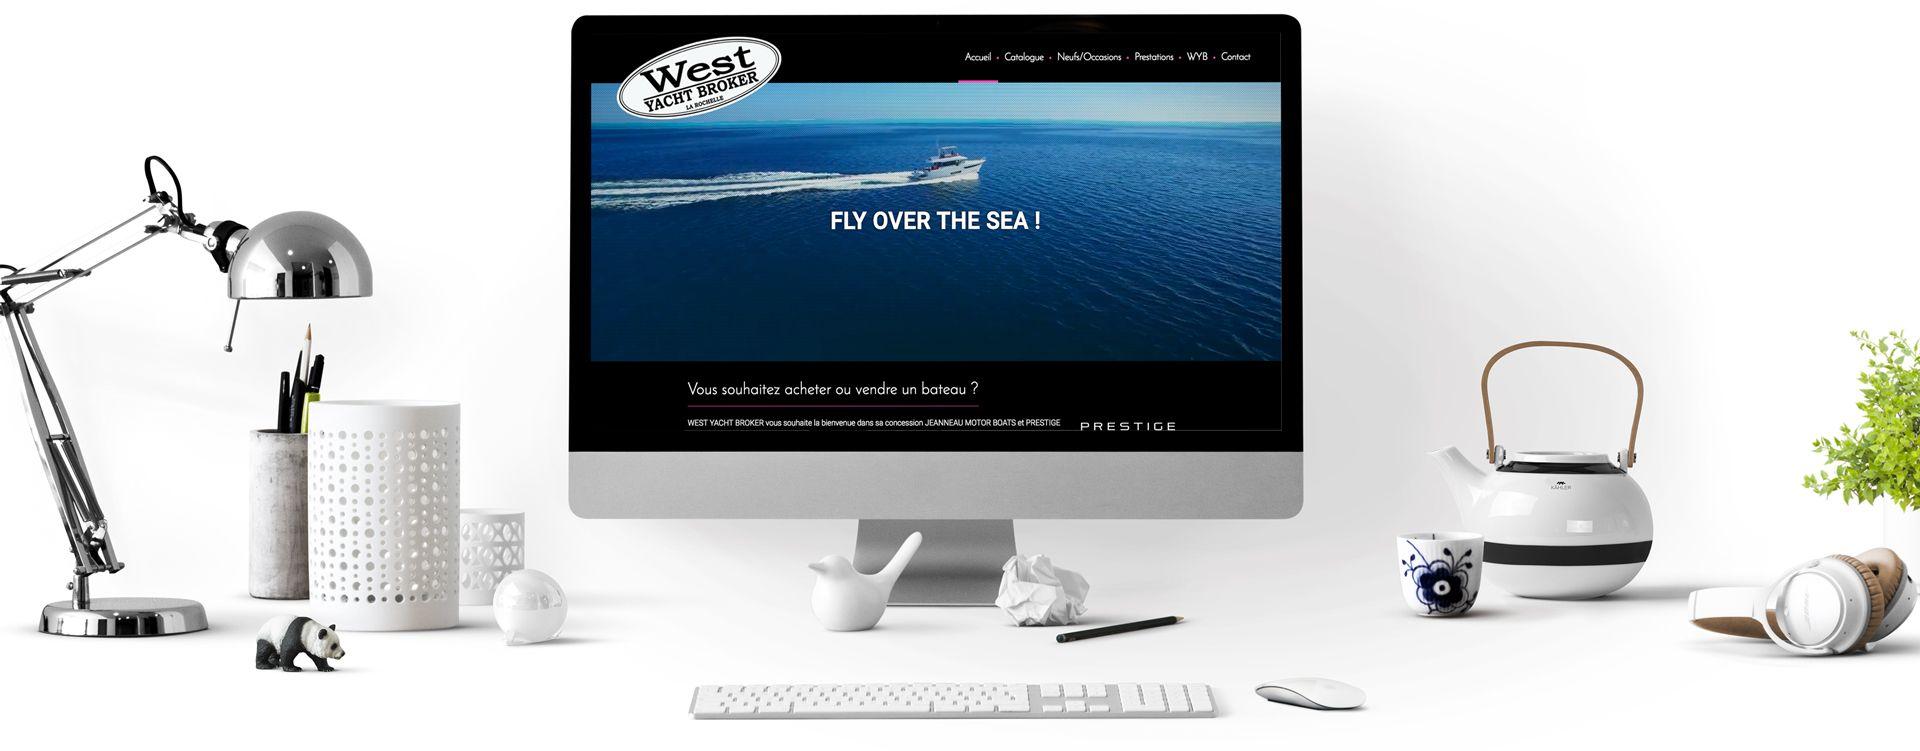 west-yacht-broker